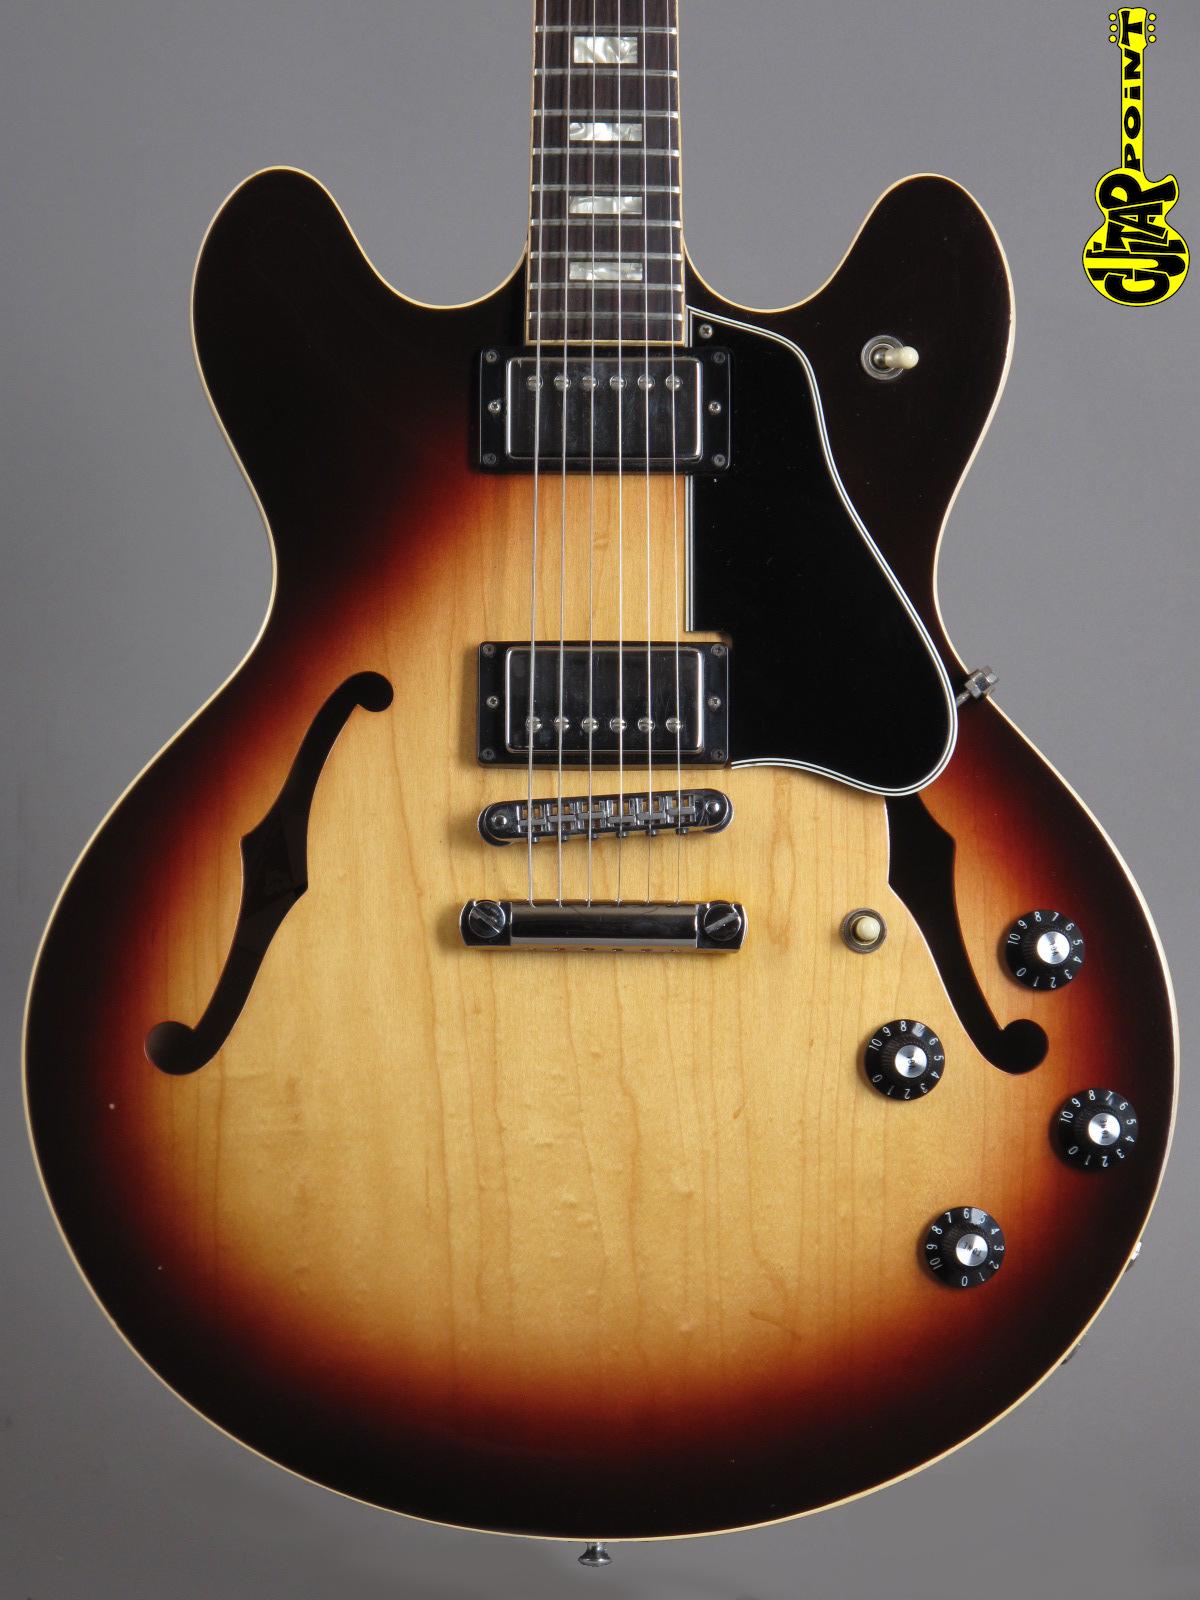 1979 Gibson ES-335 TD Stereo Sunburst - Super Rare!